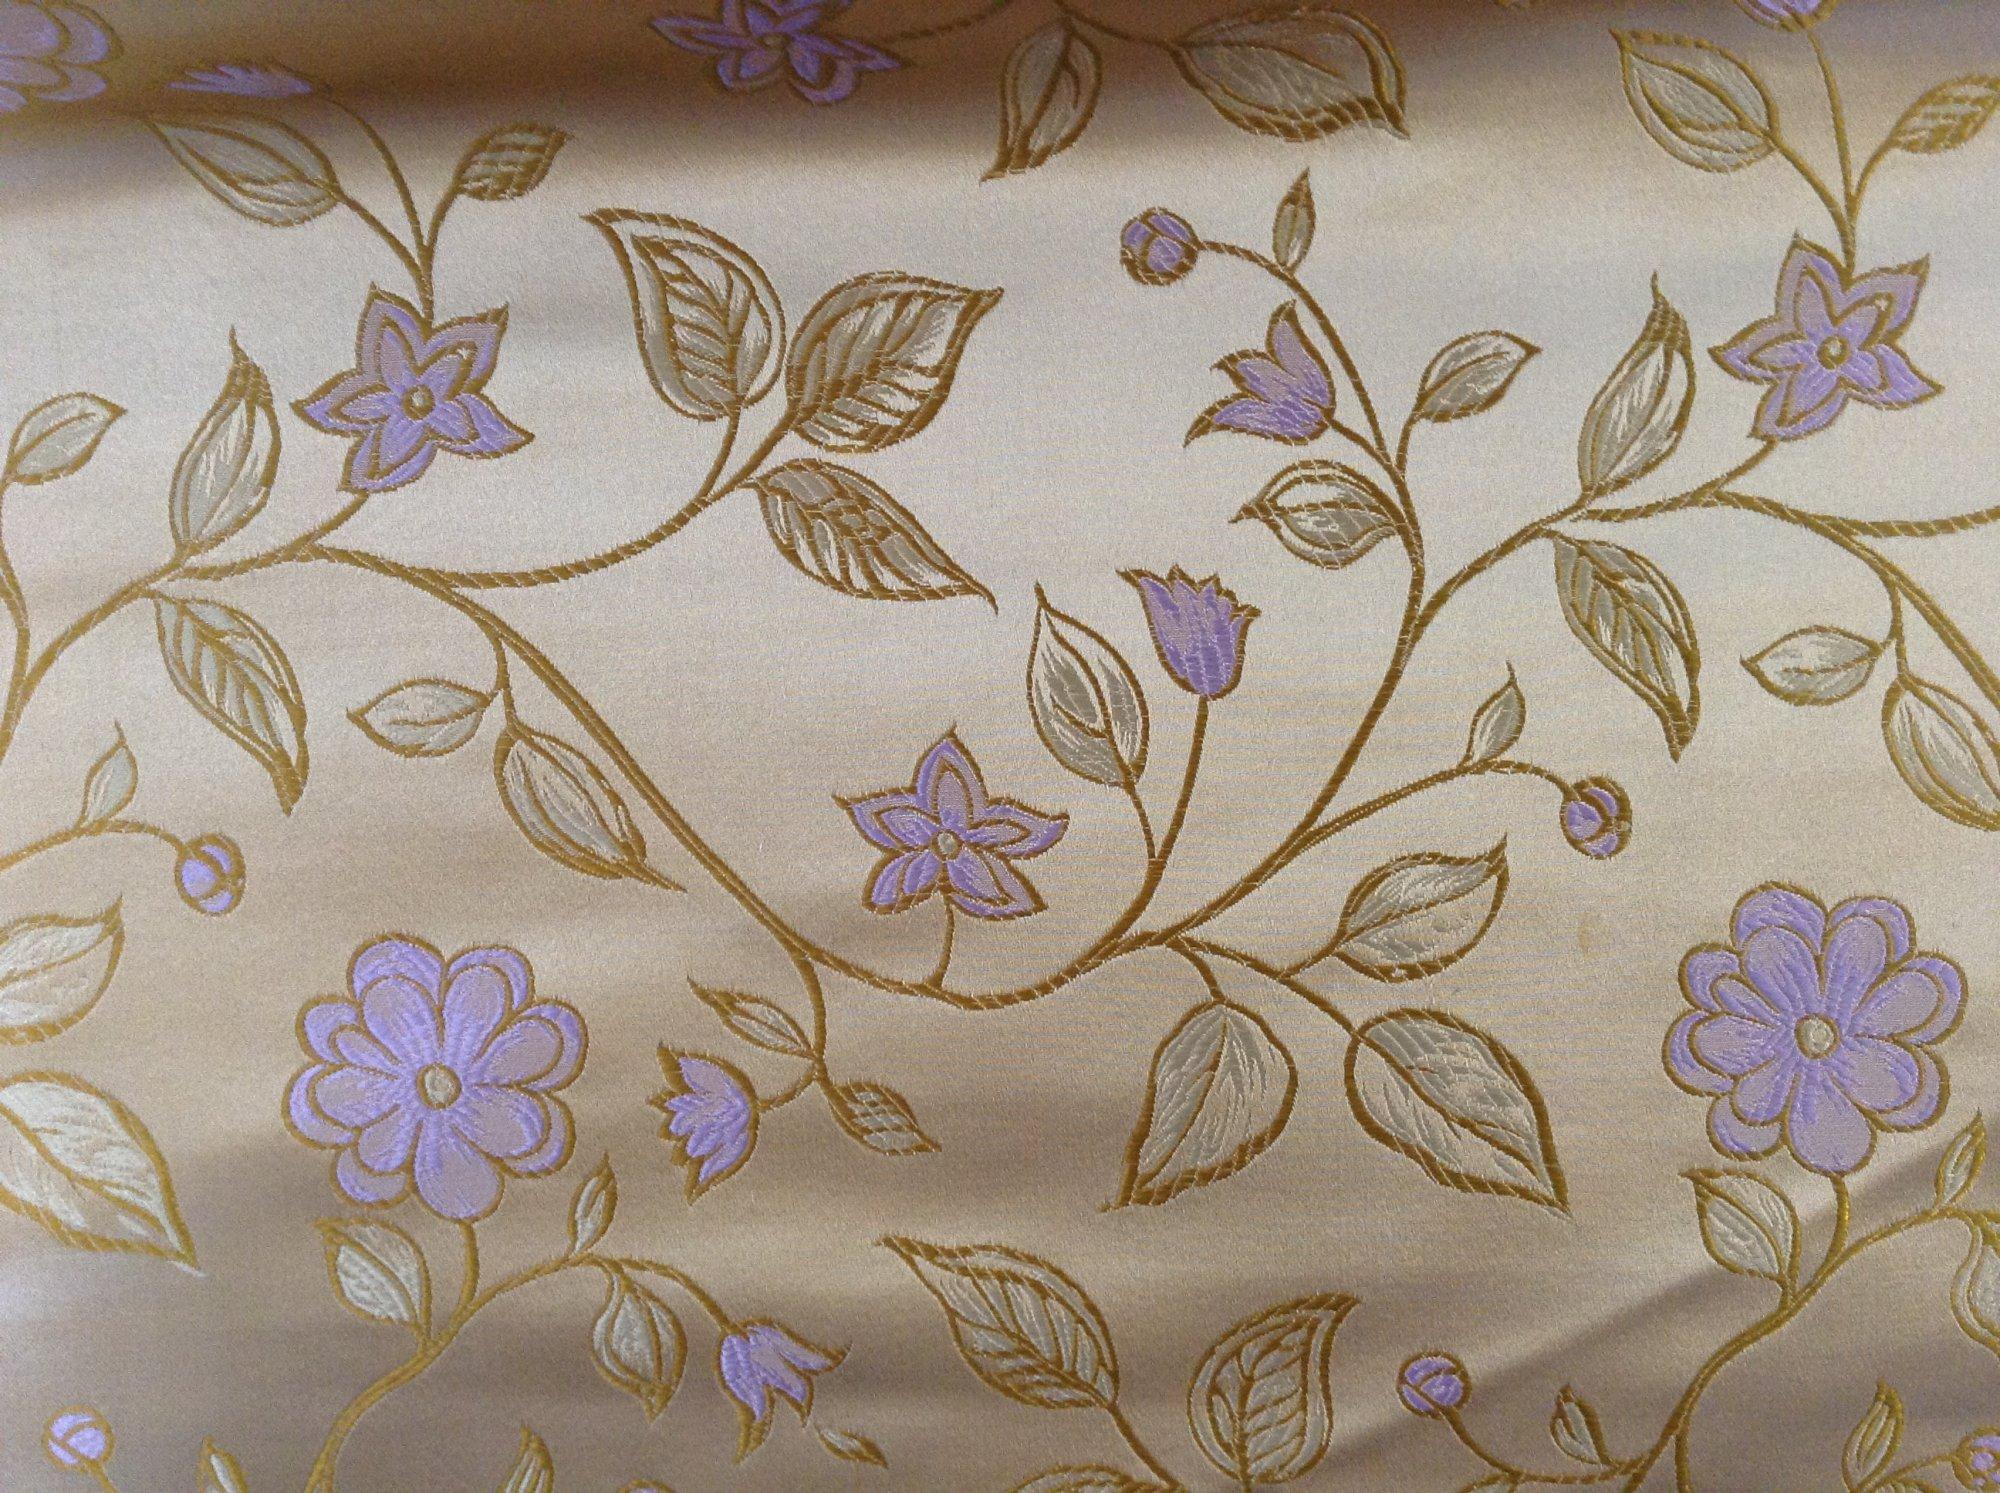 Brocade, silk satin, embroidered, gold, pink floral